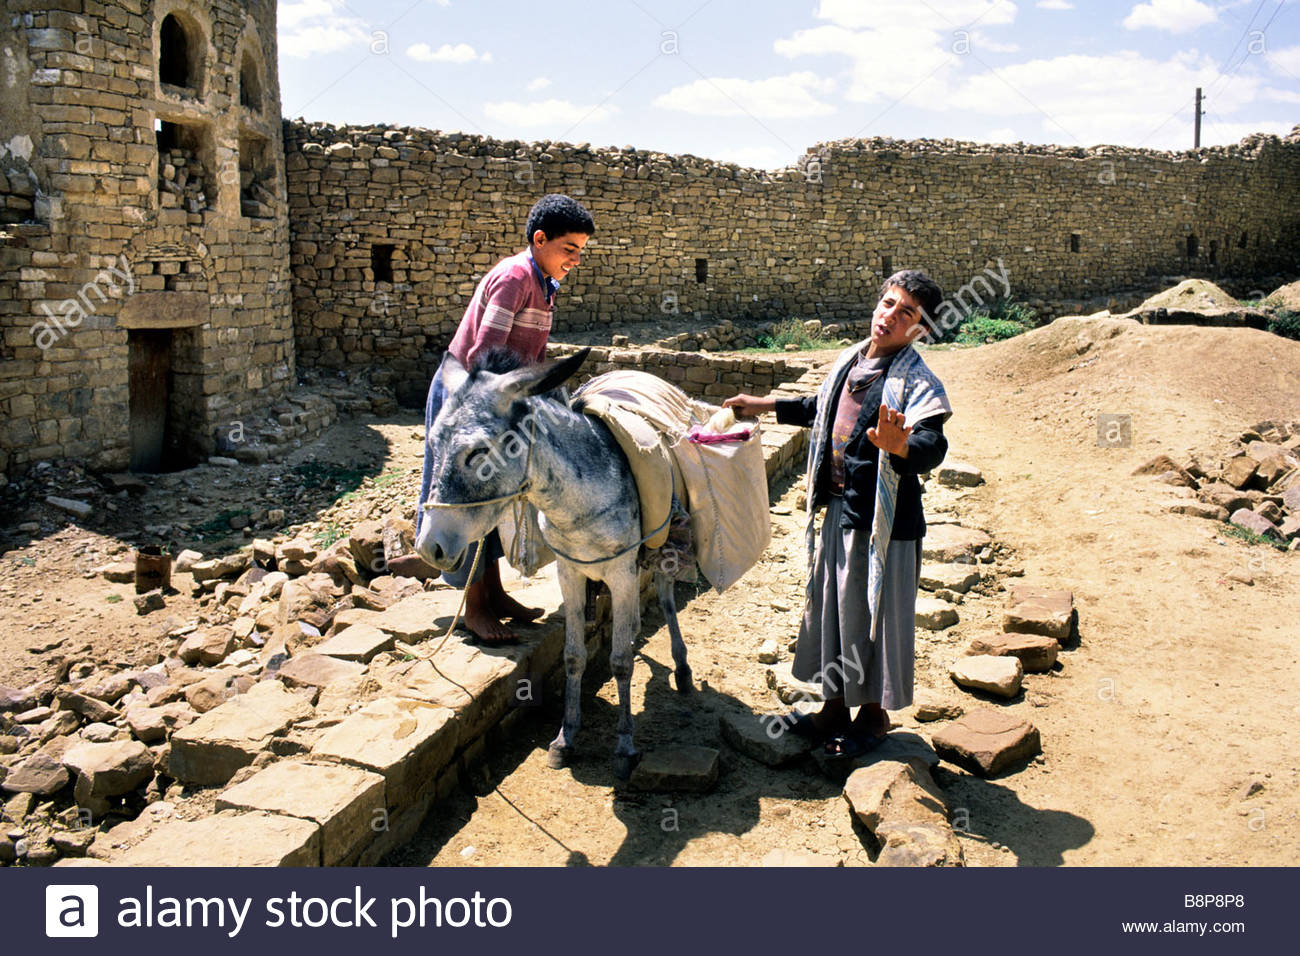 boys, yemen, arabian peninsula - Stock Image